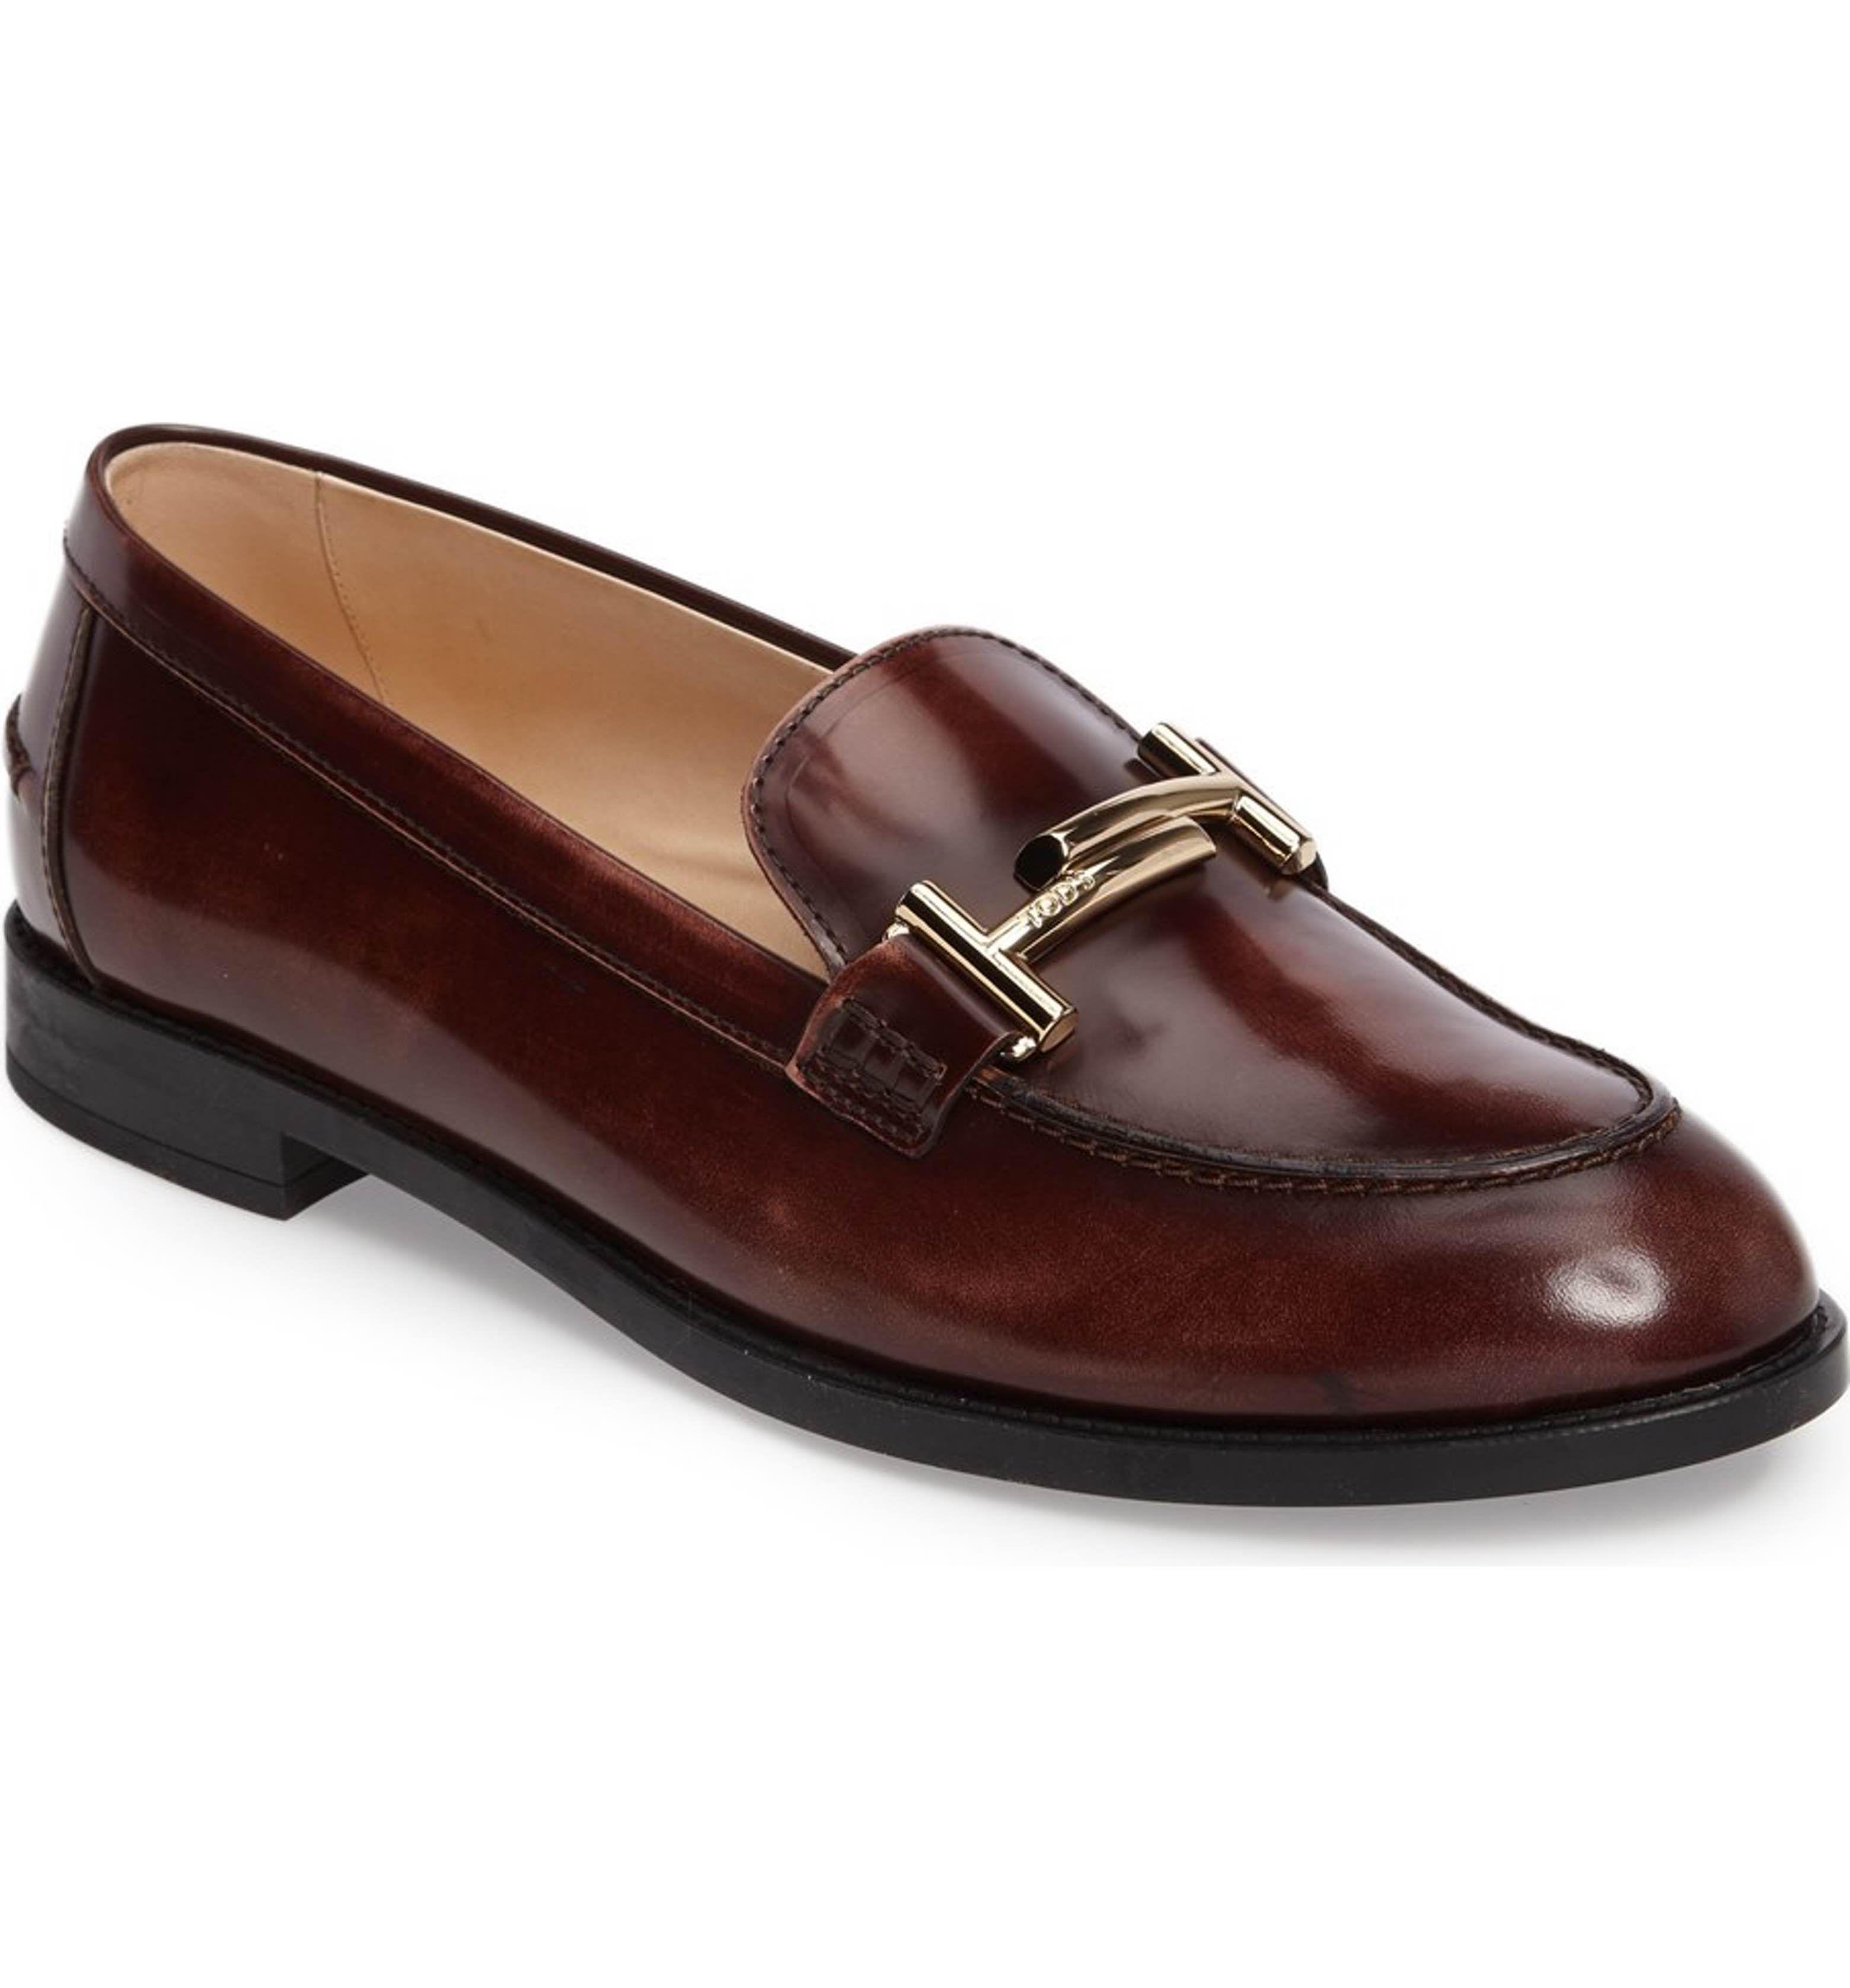 Pin on Accessories \u0026 footwear